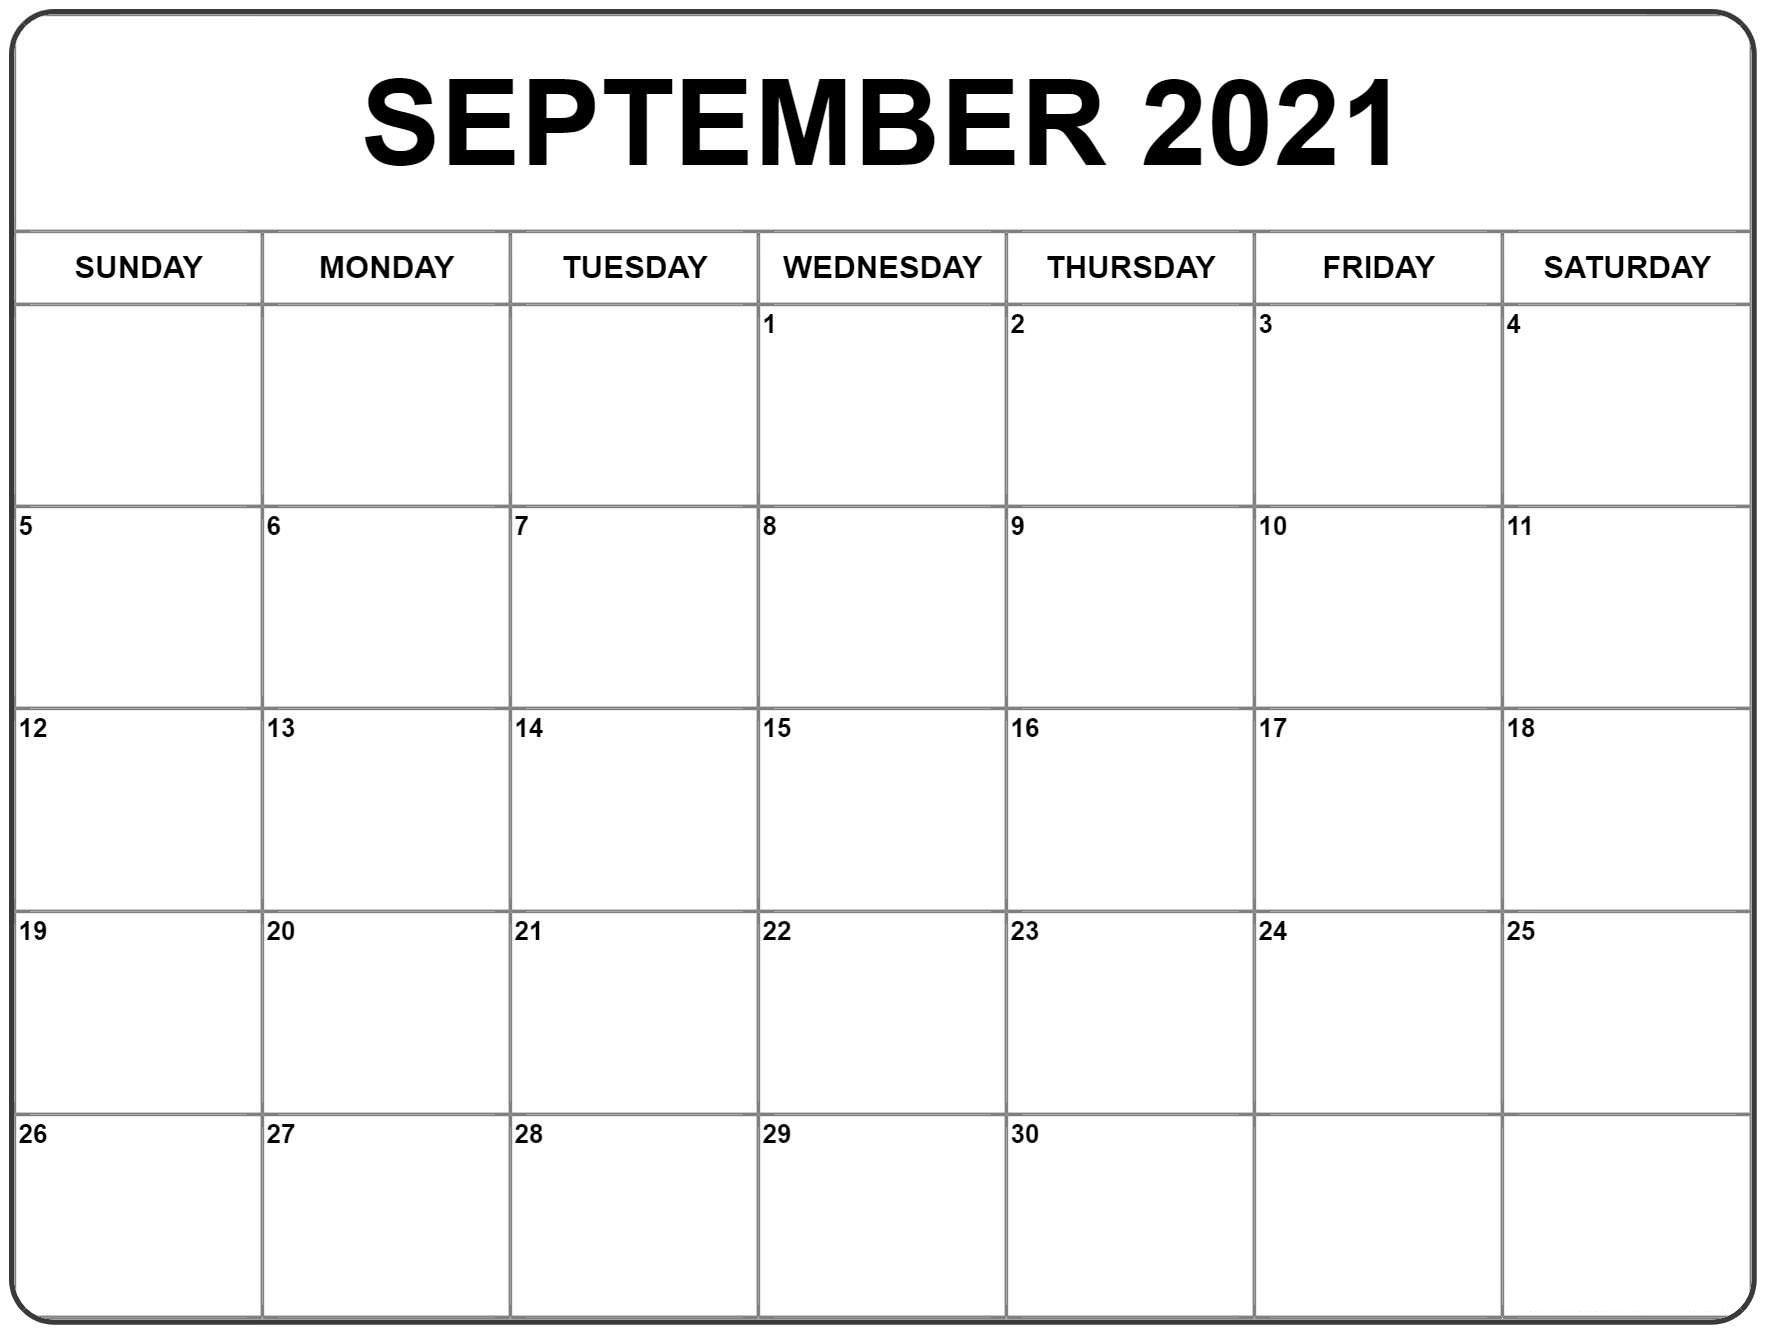 Catch September 2021 Calendar Printable Images